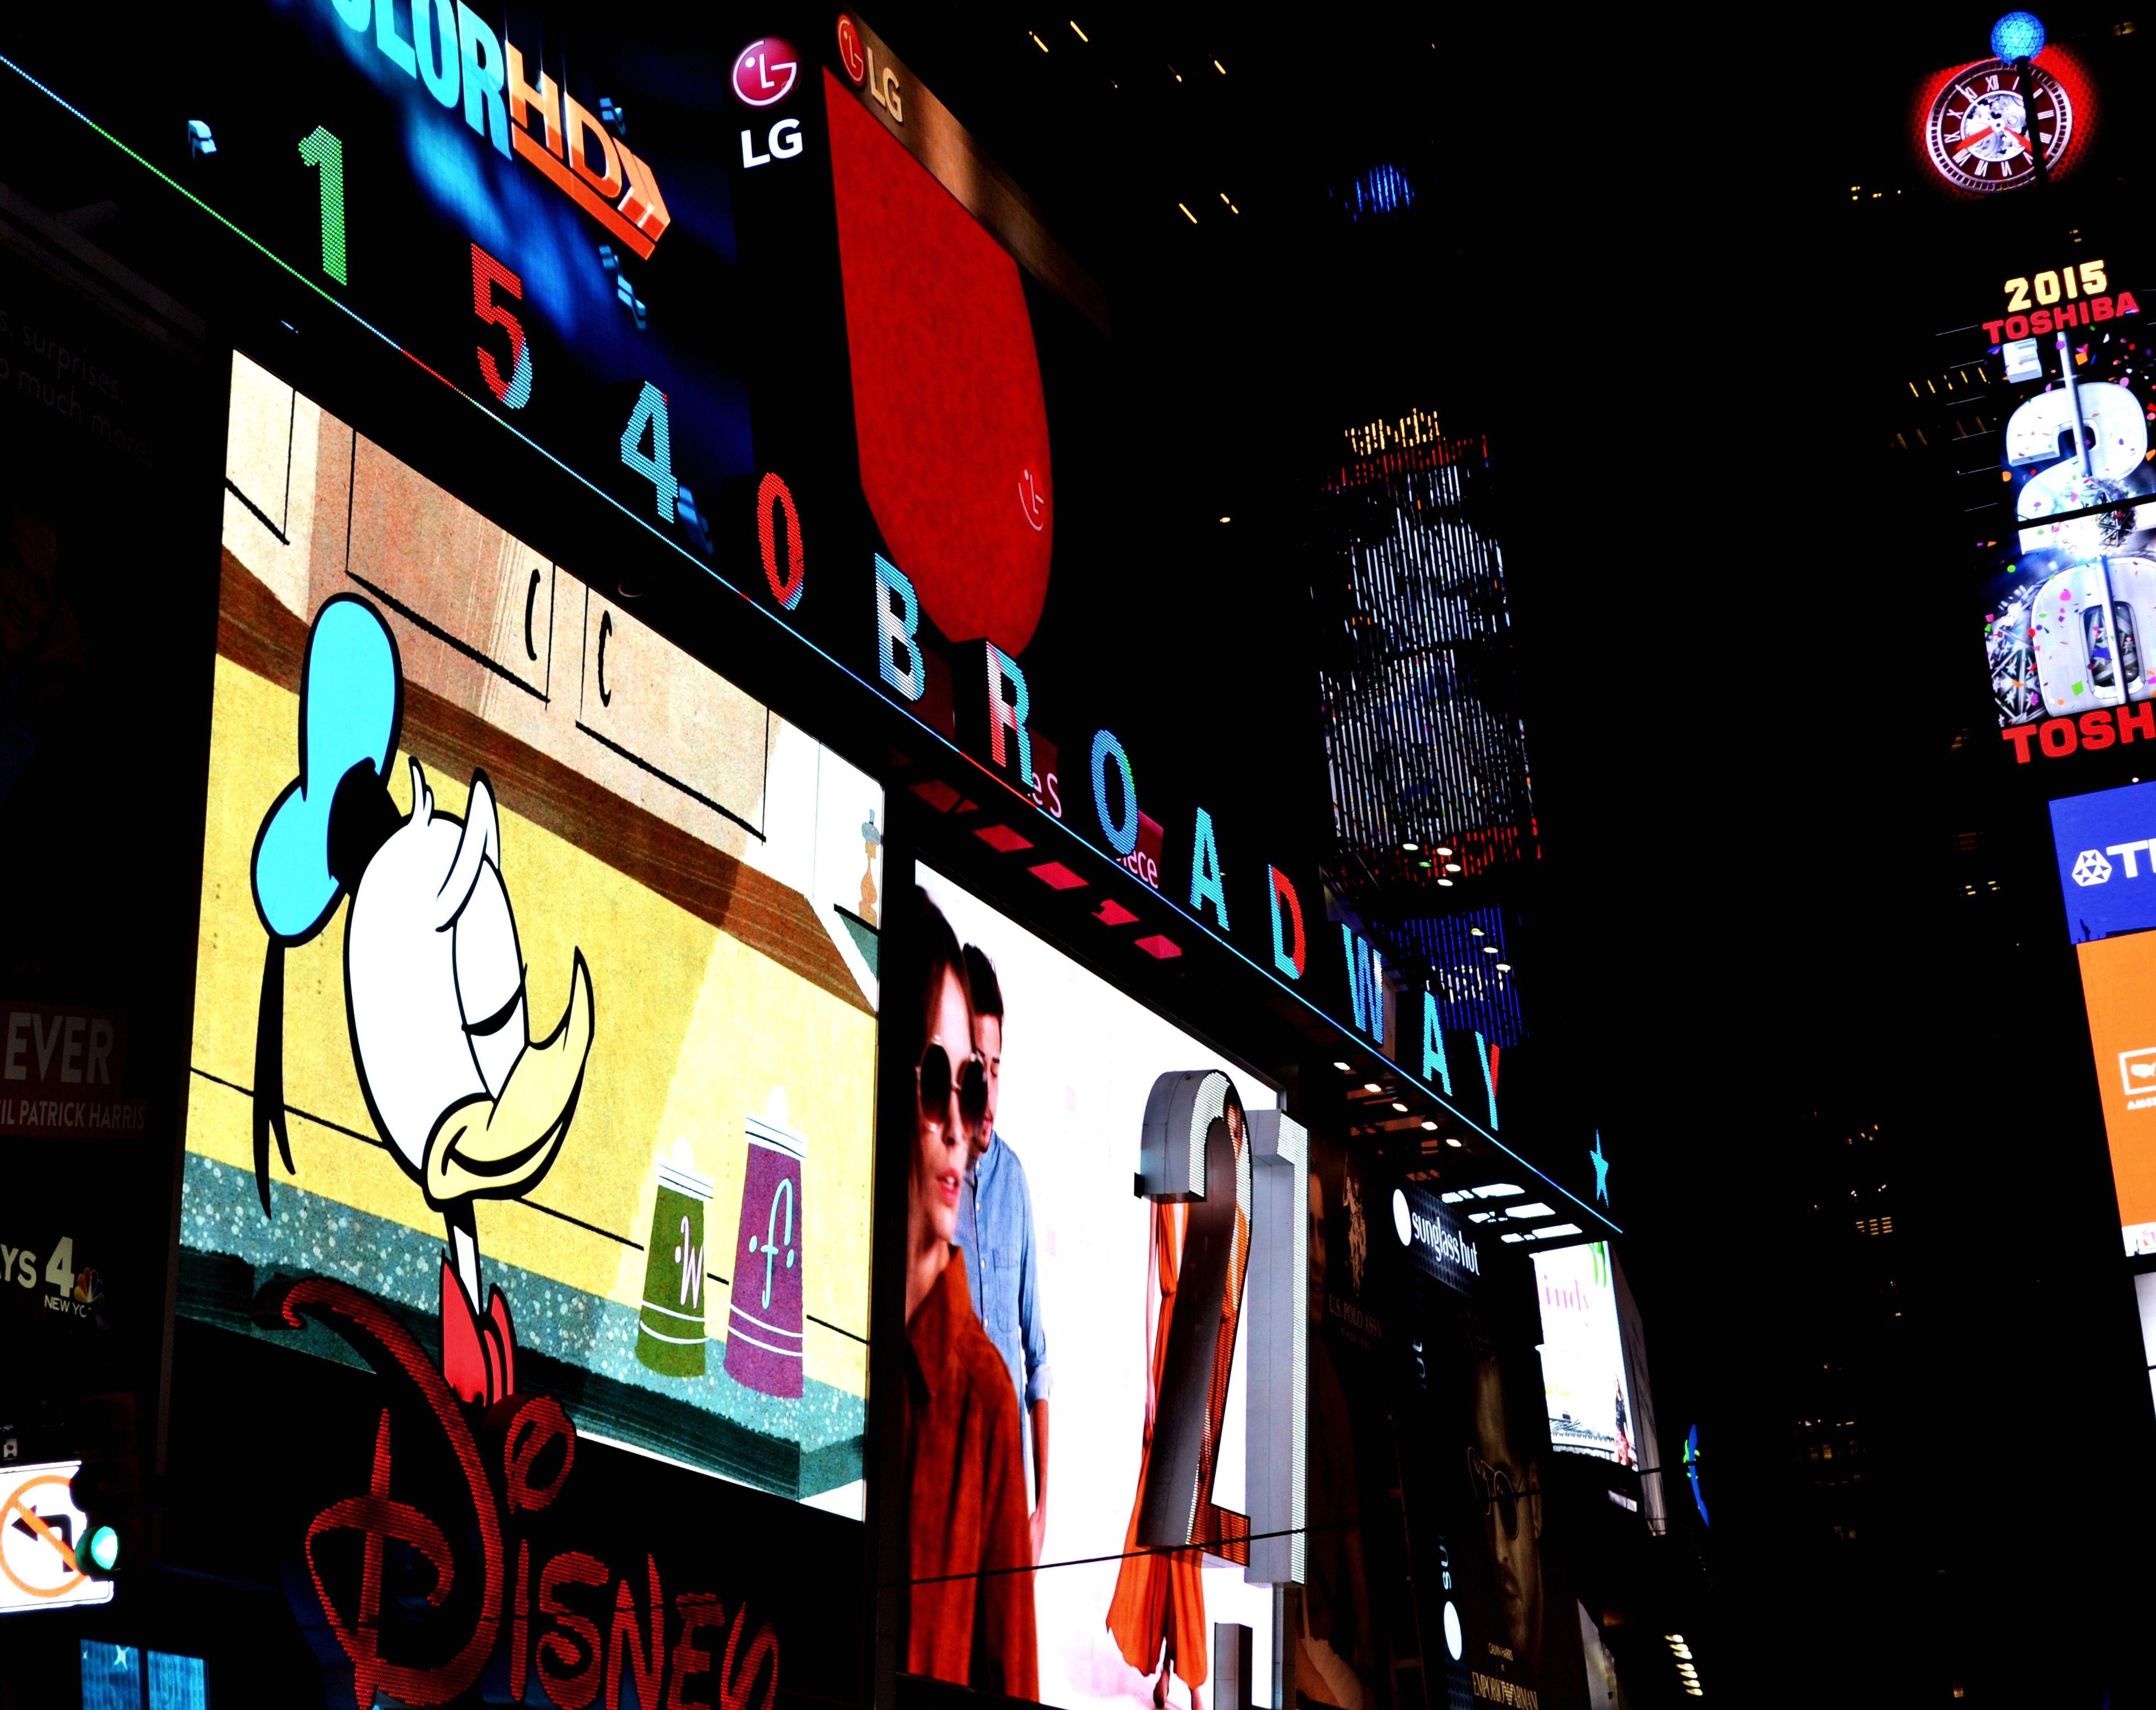 night, multi colored, illuminated, city, outdoors, nightlife, neon, architecture, people